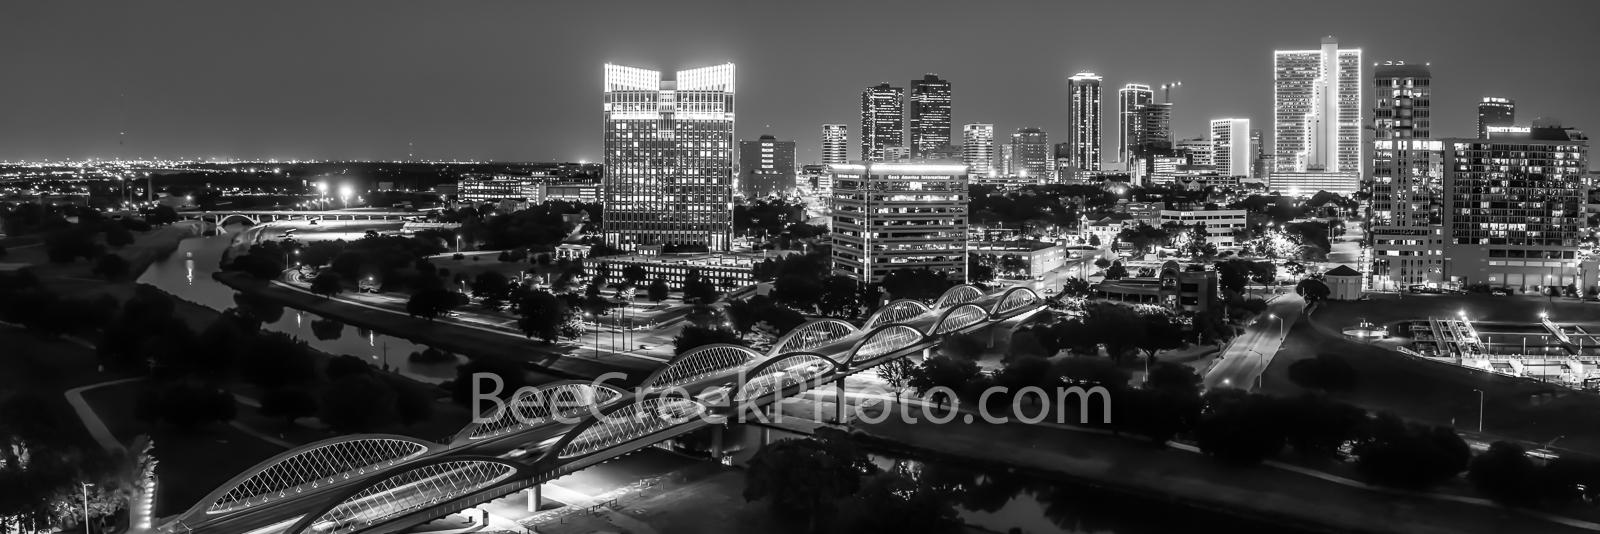 Fort Worth Skyline BW Pano 2 -